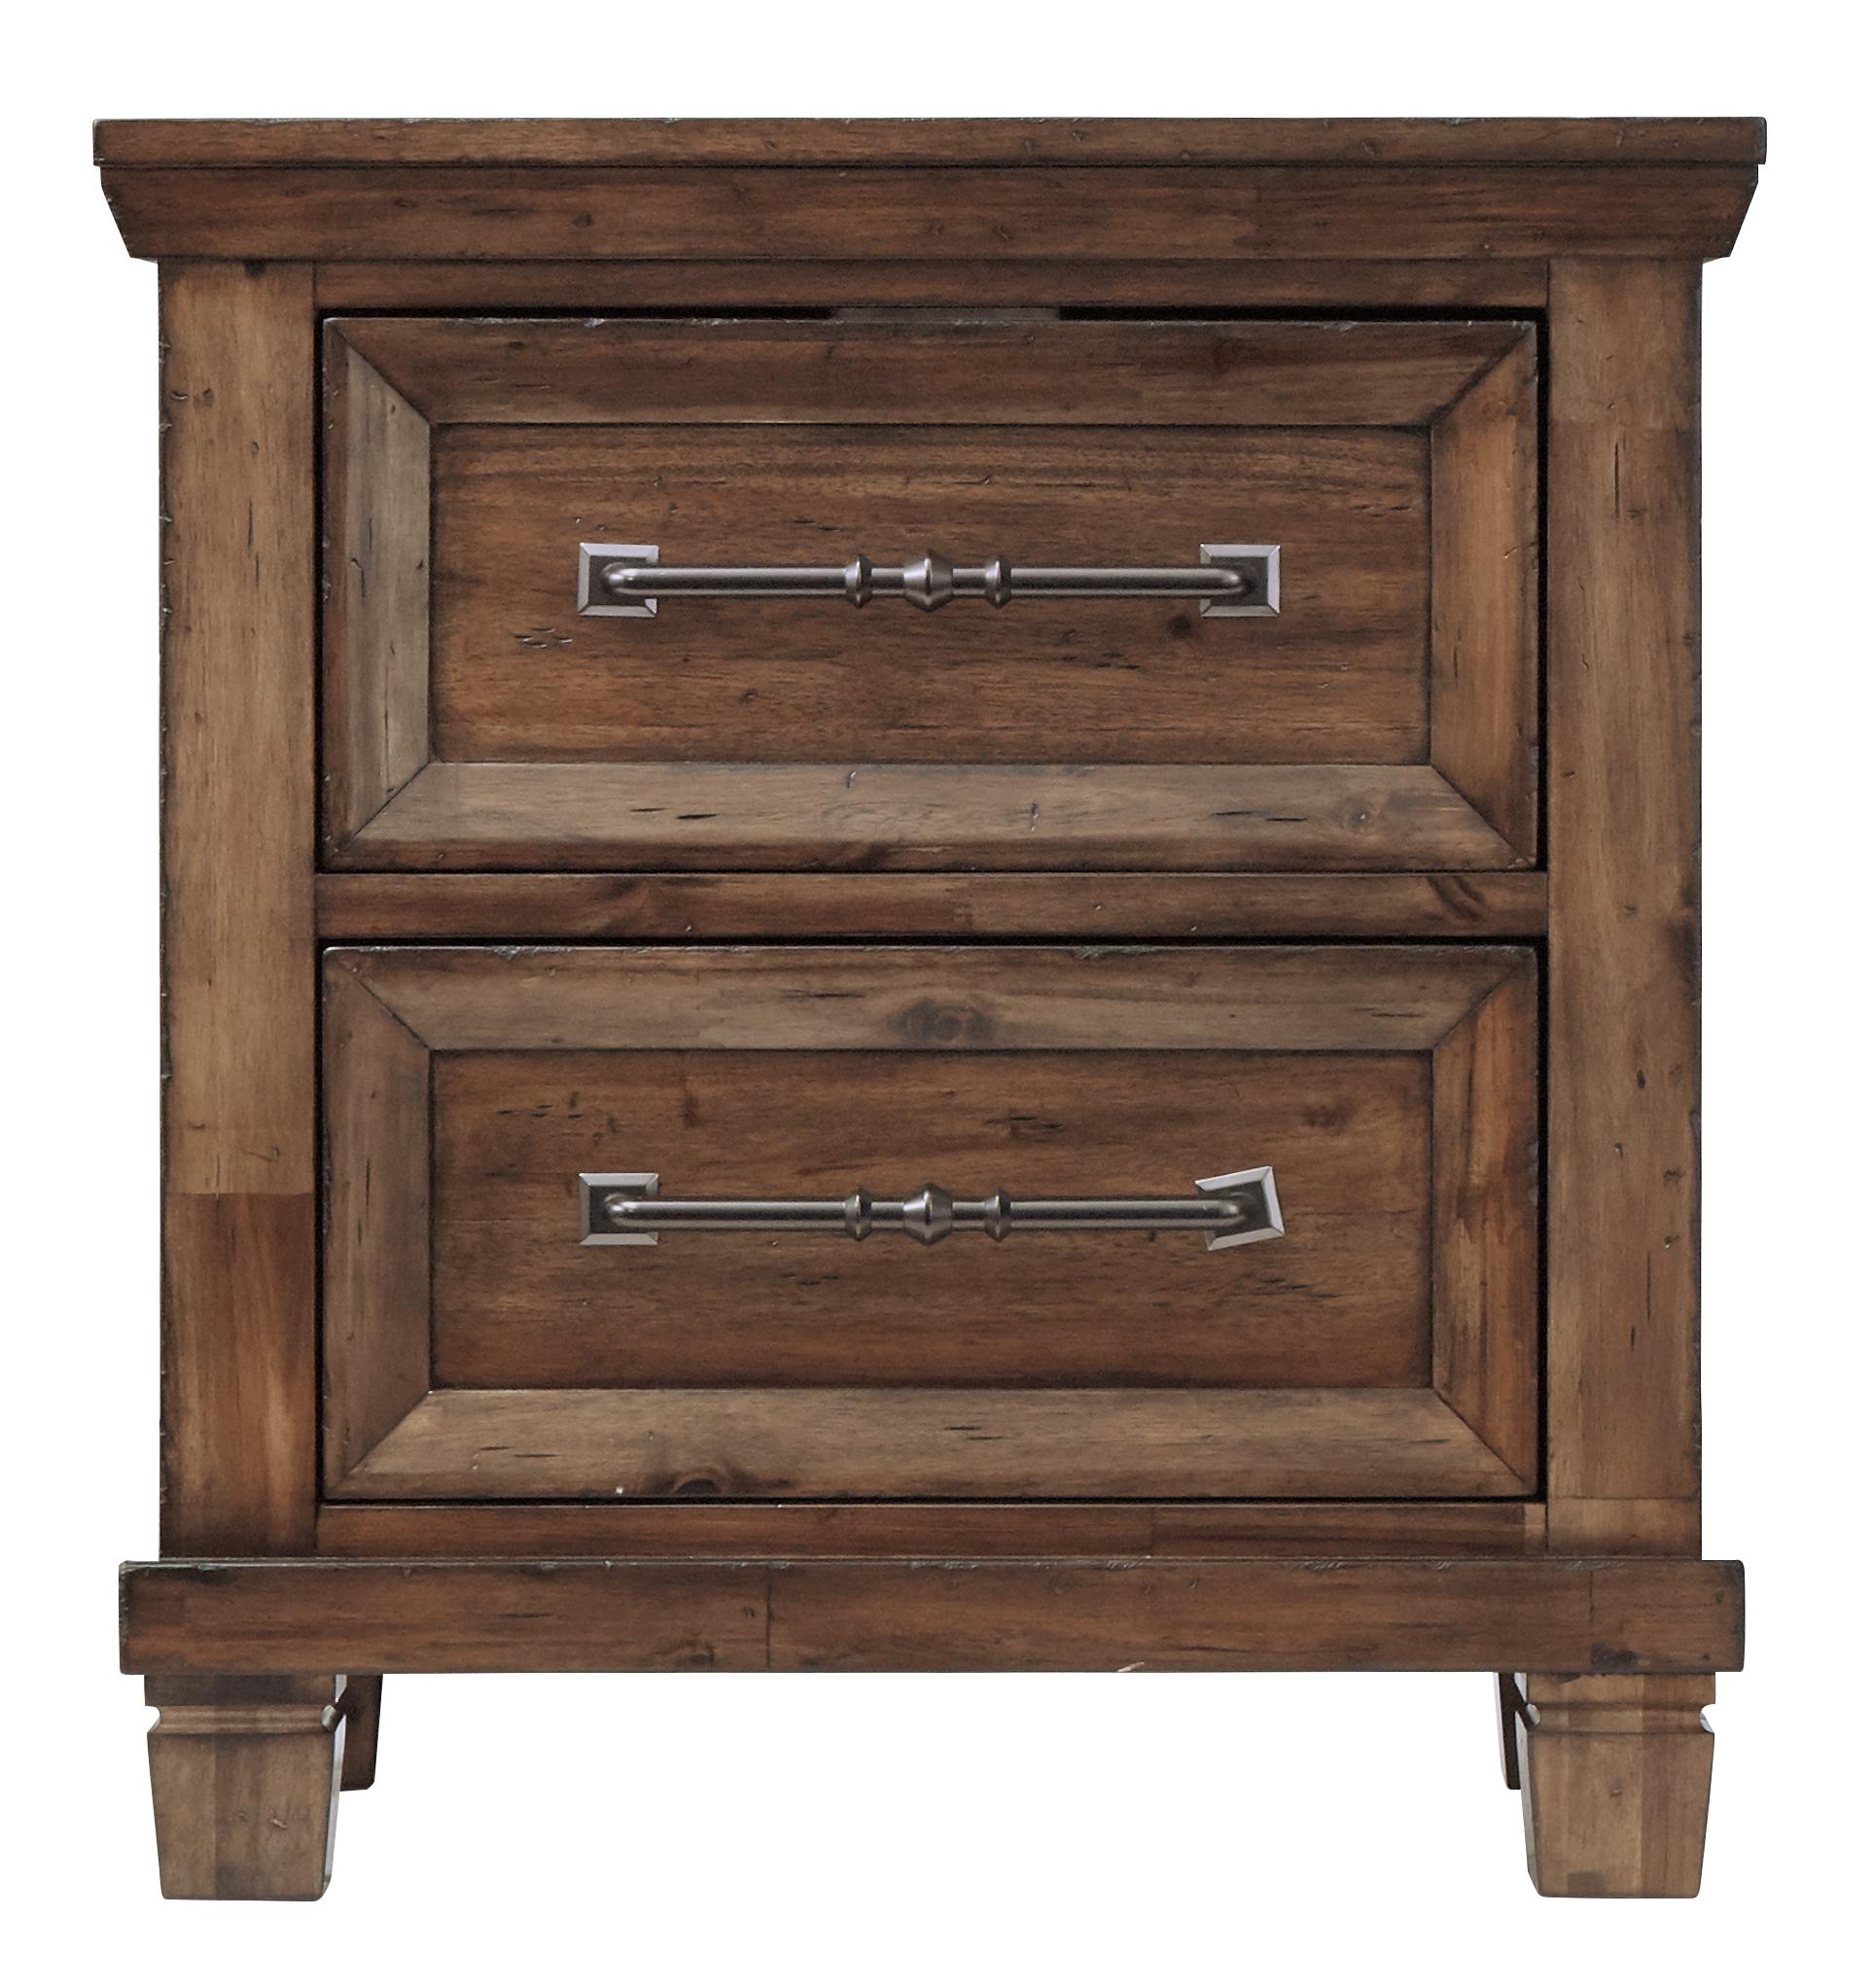 Royard Nightstand By Millennium By Ashley B76592 Missouri Furniture